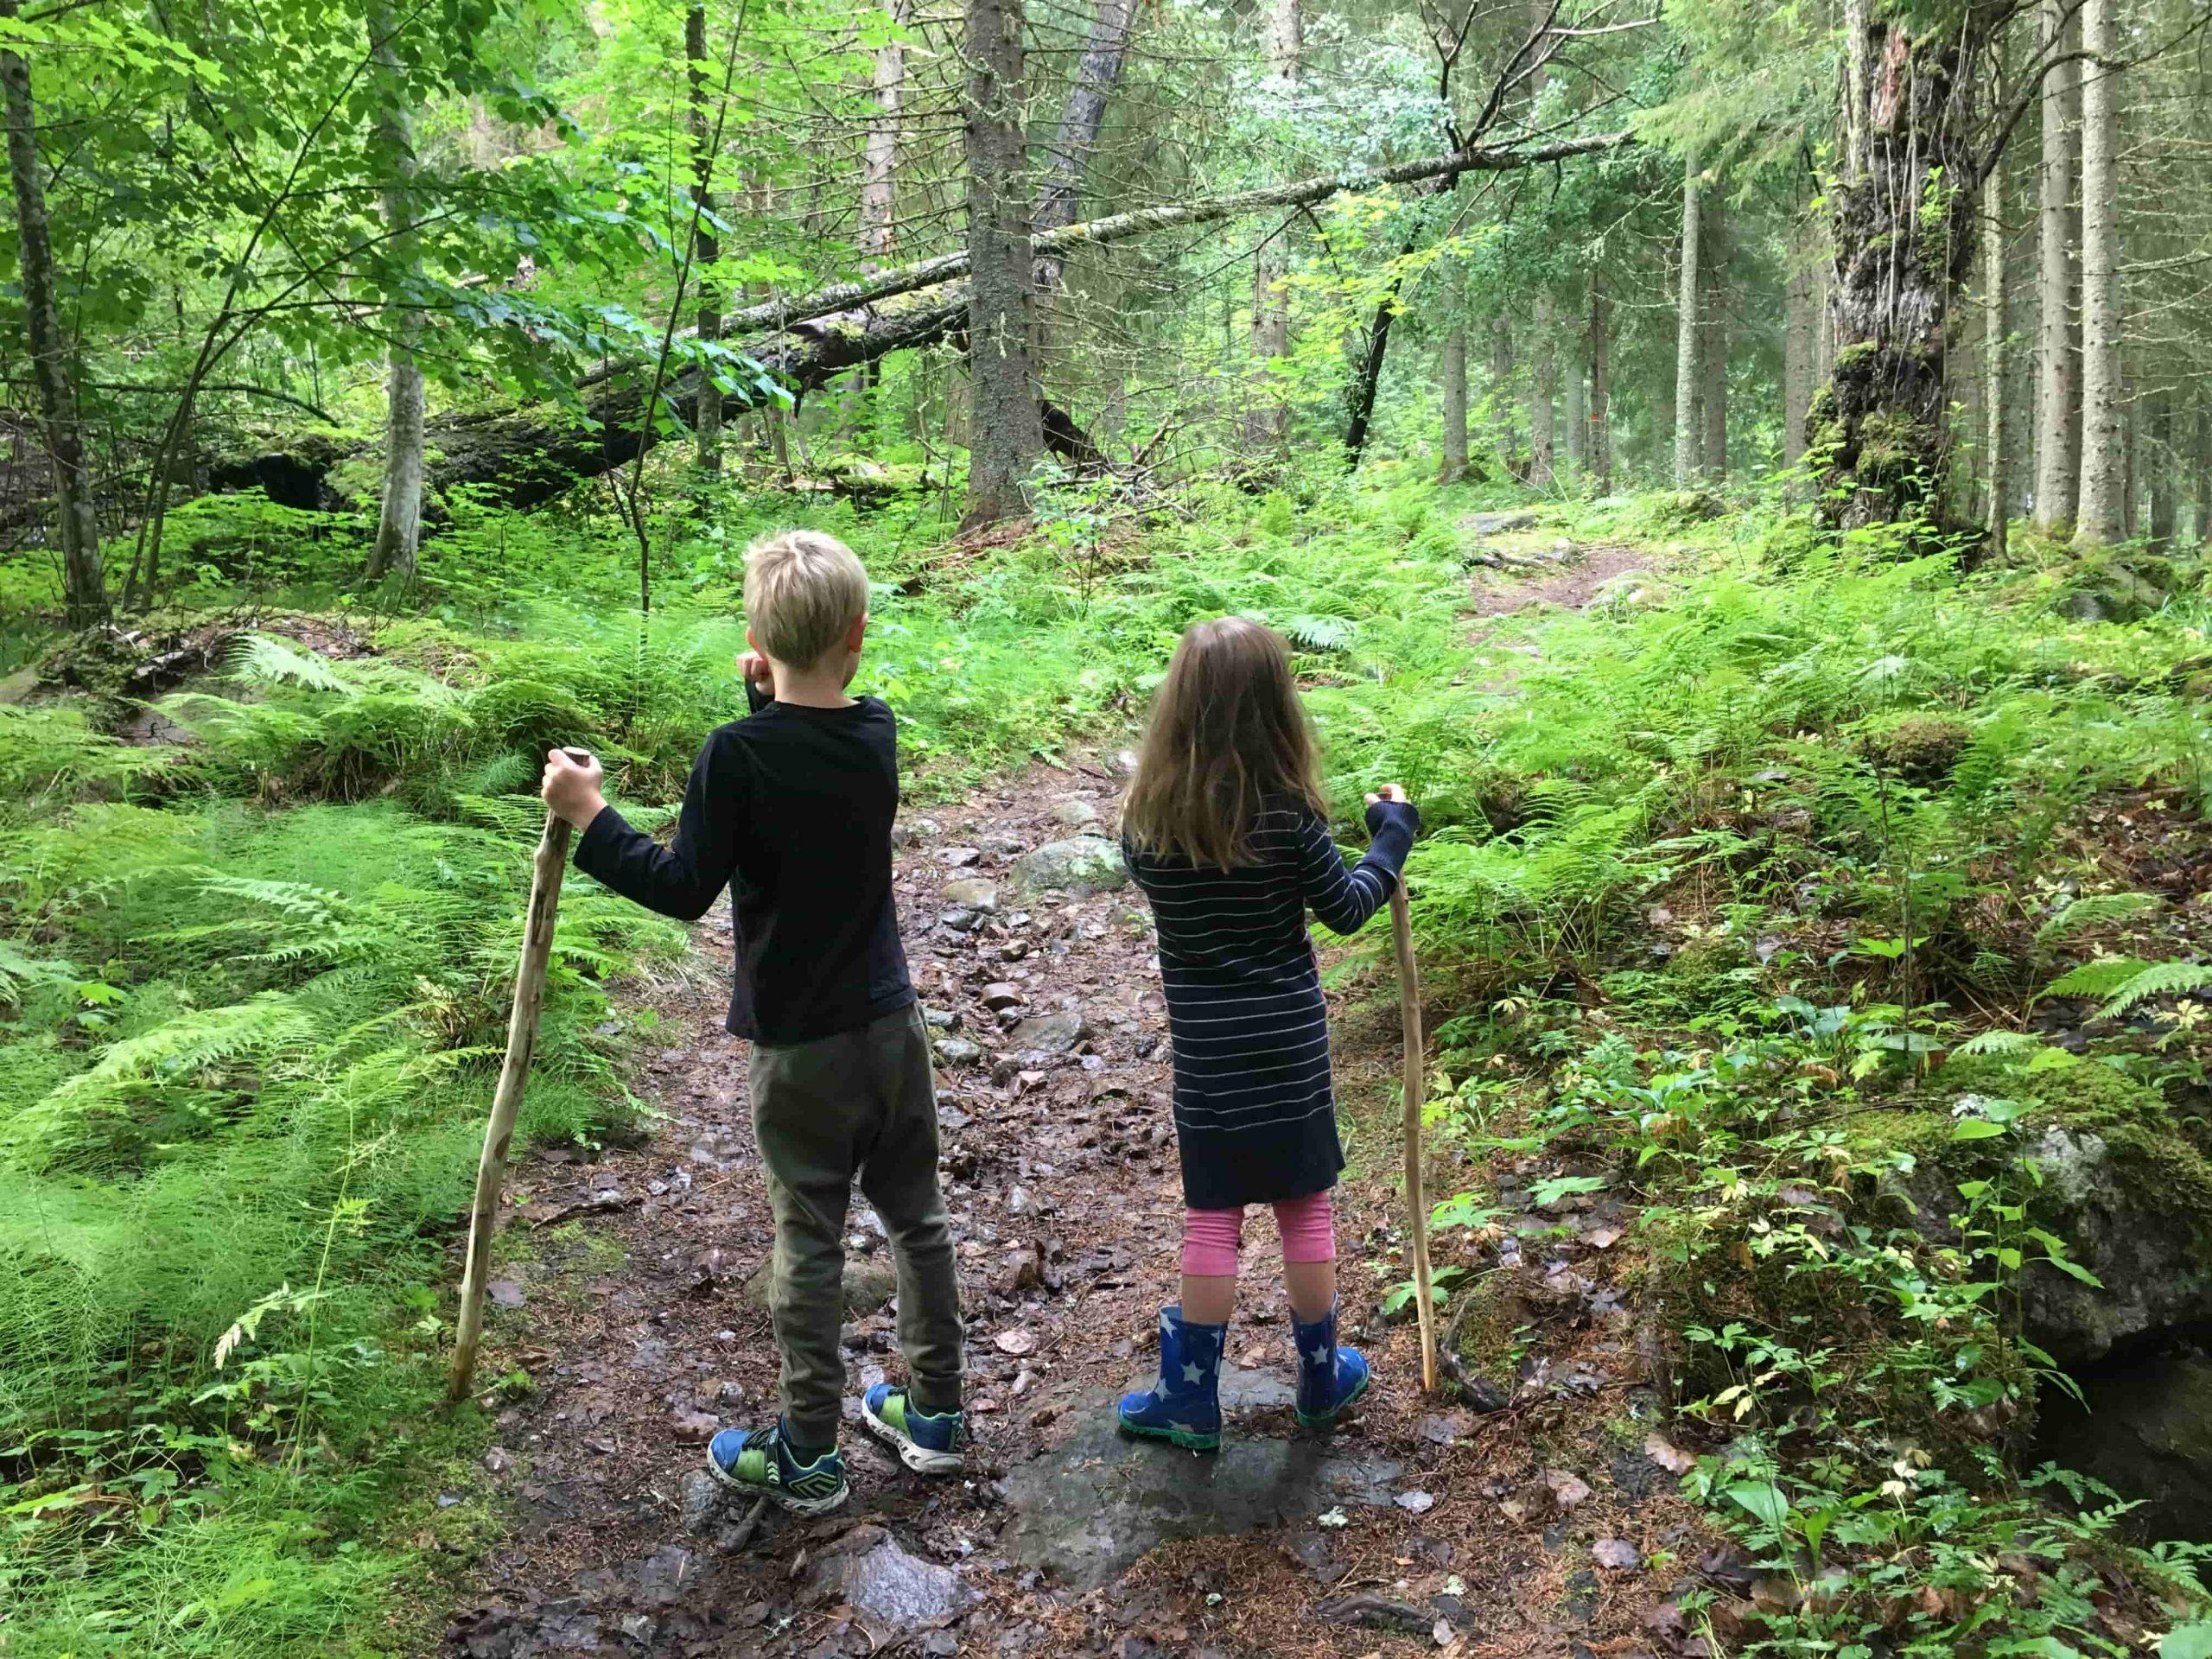 woods_full-scaled.jpeg